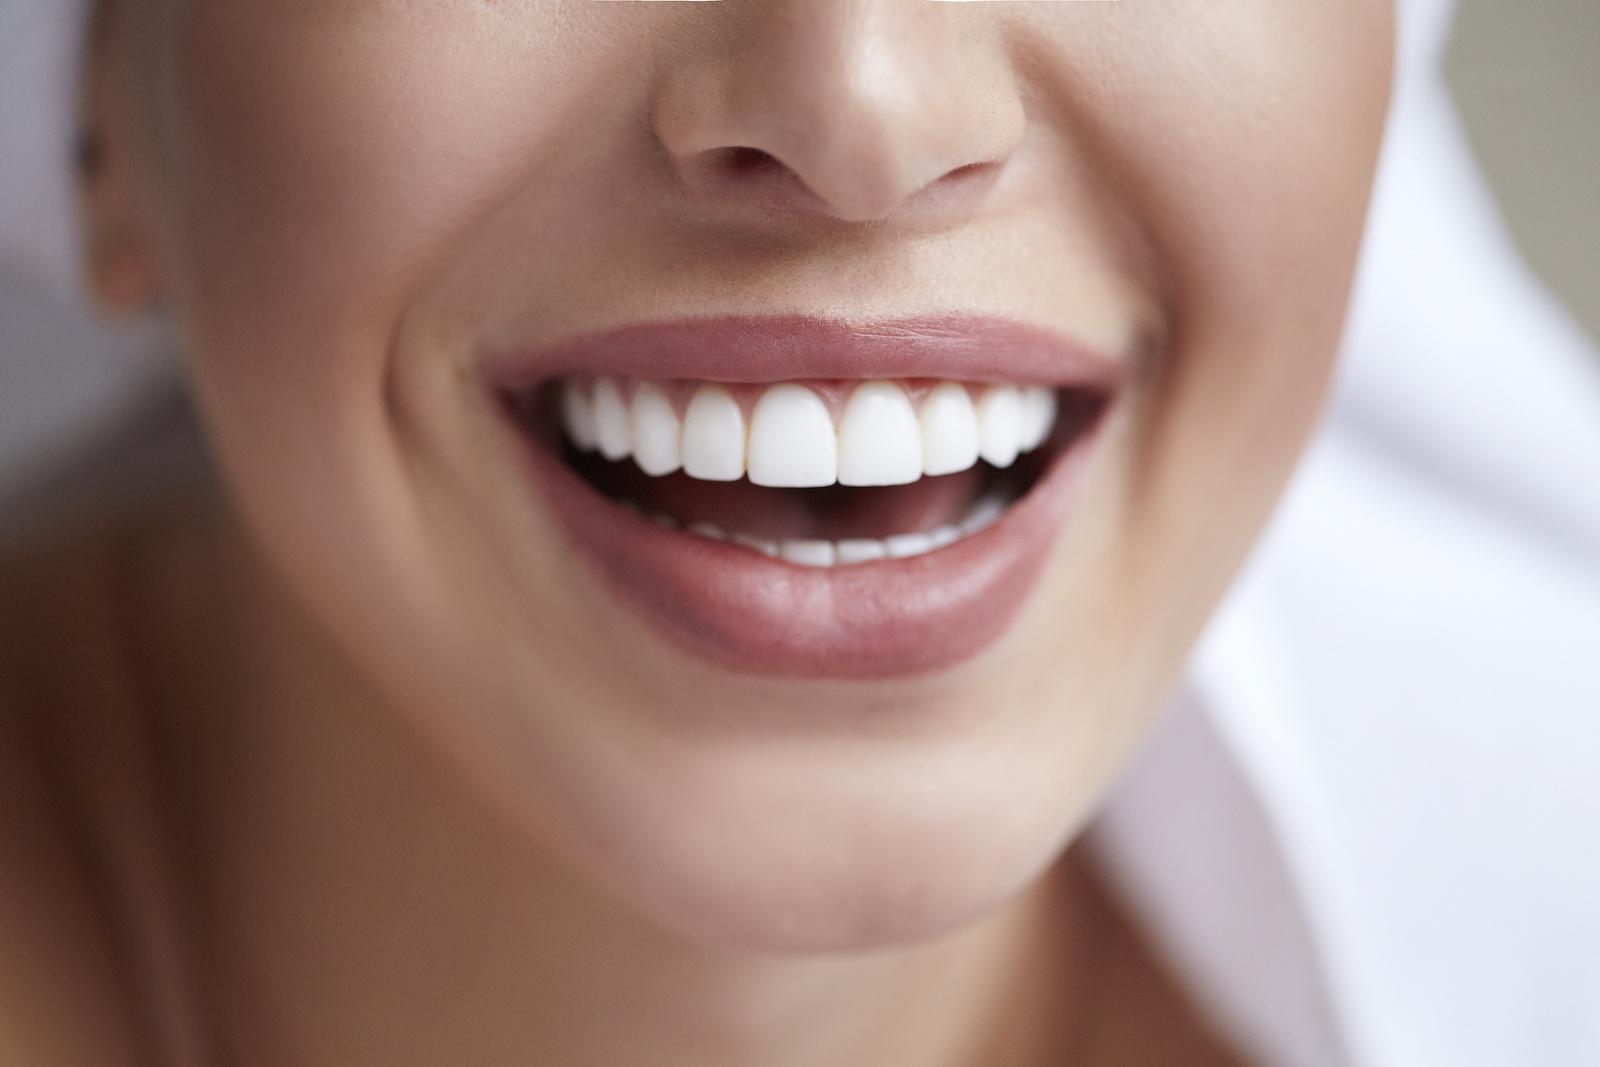 What's the Best Way to Whiten Teeth? OTC vs. Professional Whitening